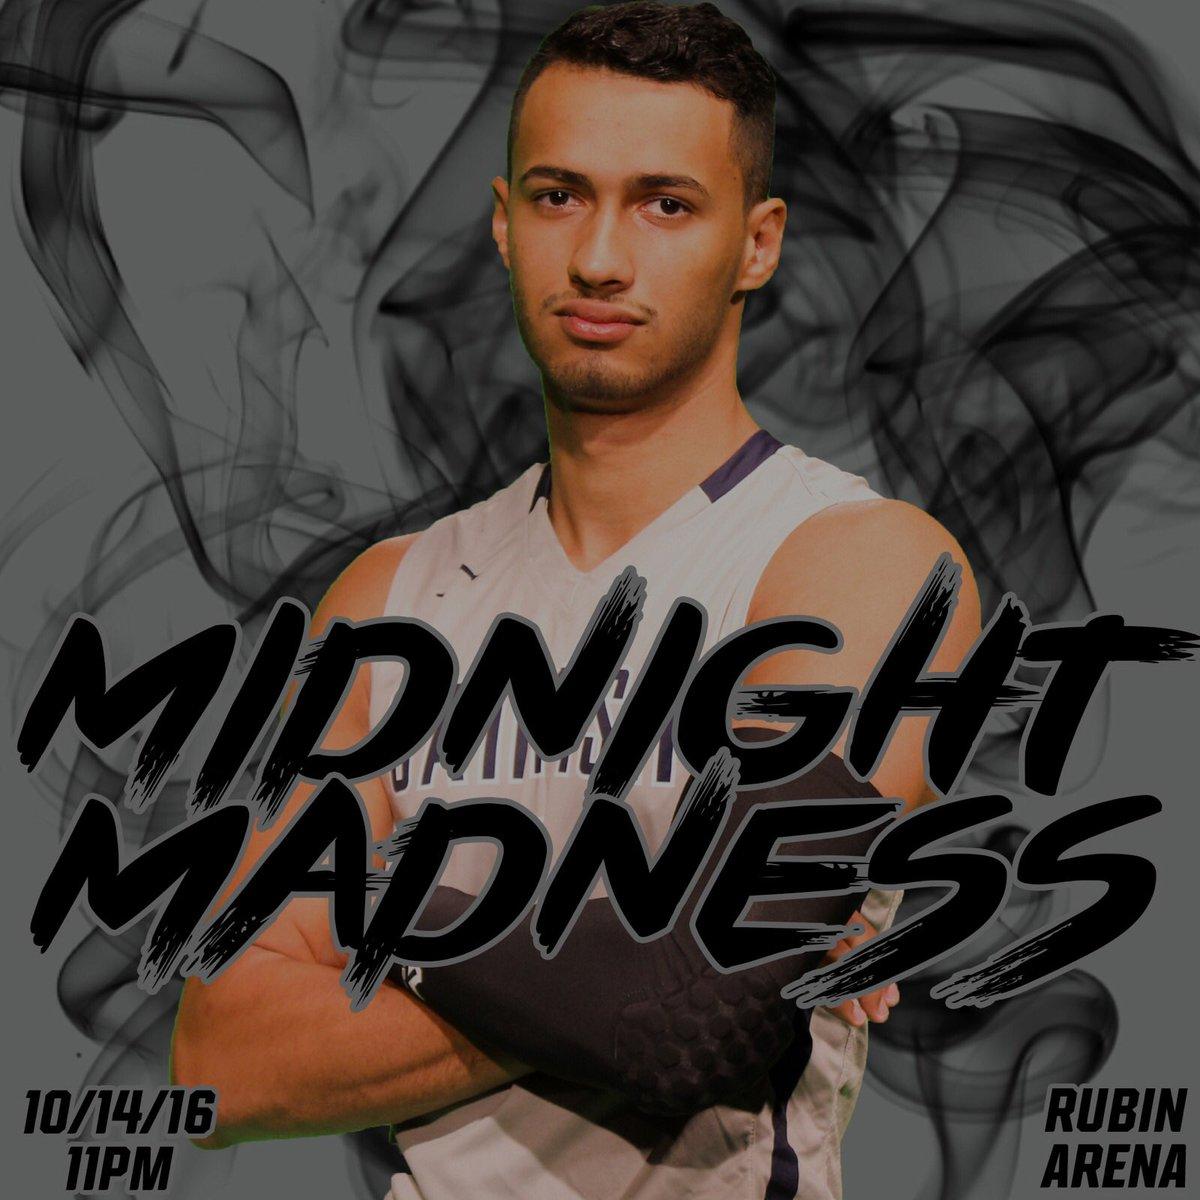 Too pumped for tonight. #MidnightMadness @SailfishMBB @SailfishWBB @SailfishFanatic https://t.co/6IhAlkFluv